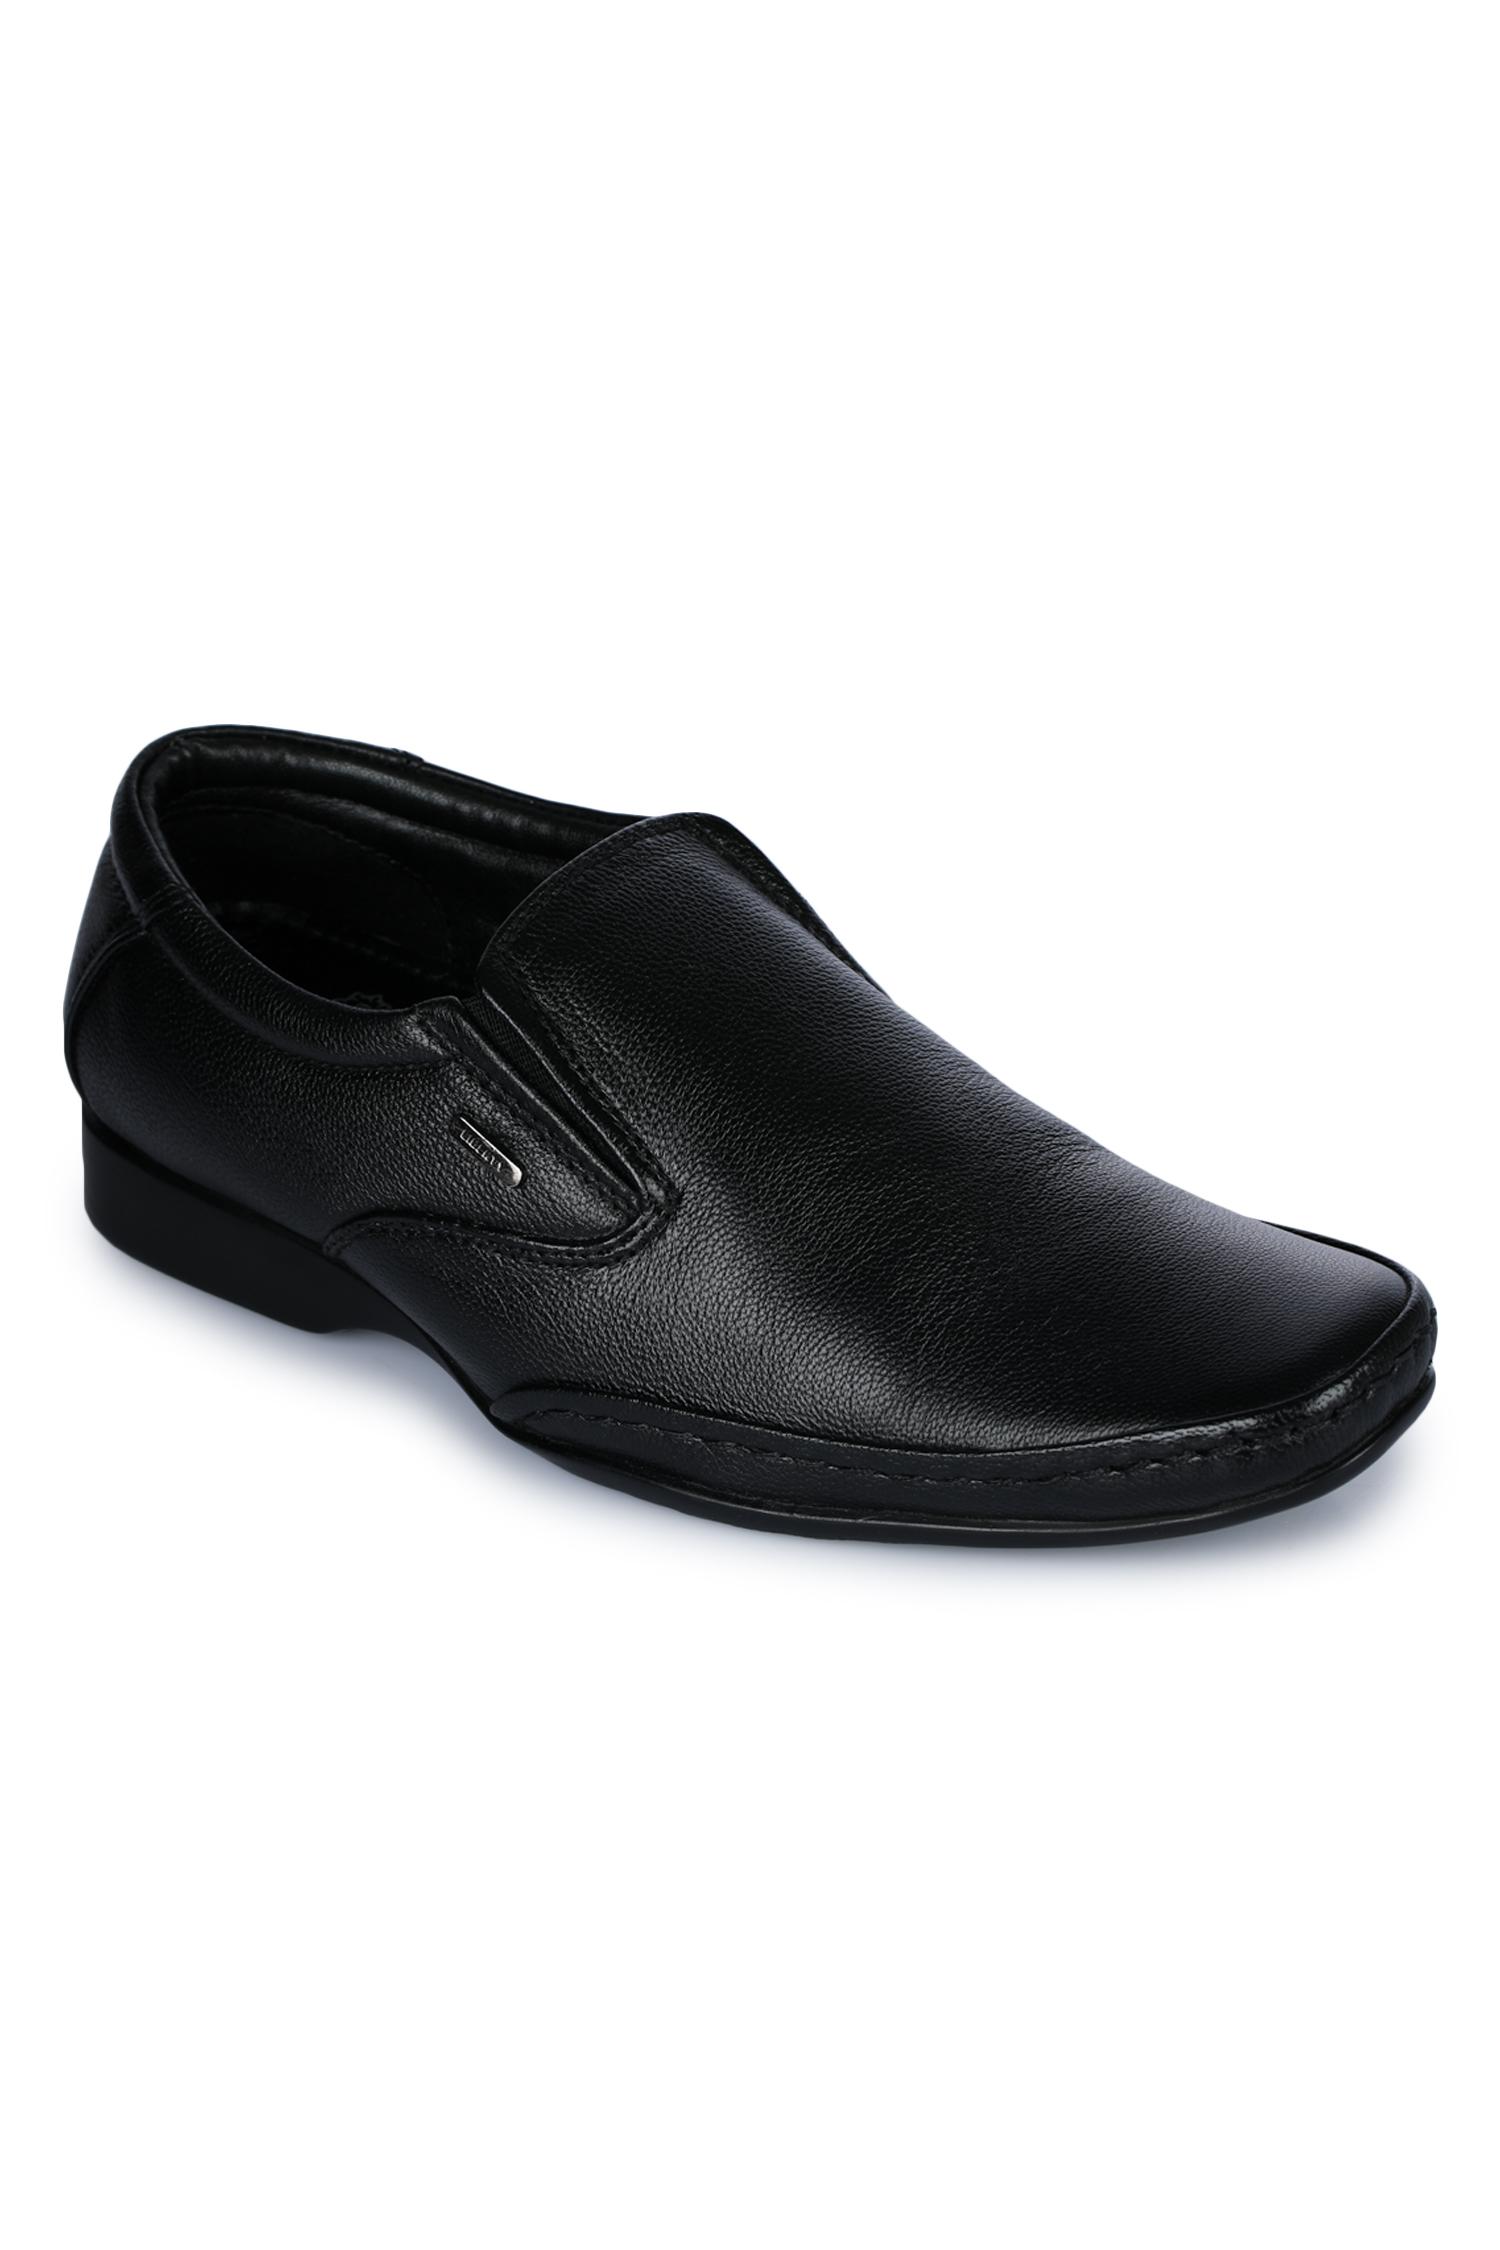 Liberty | Liberty Fortune Black Formal Oxfords Shoes FL-511_Black For - Men